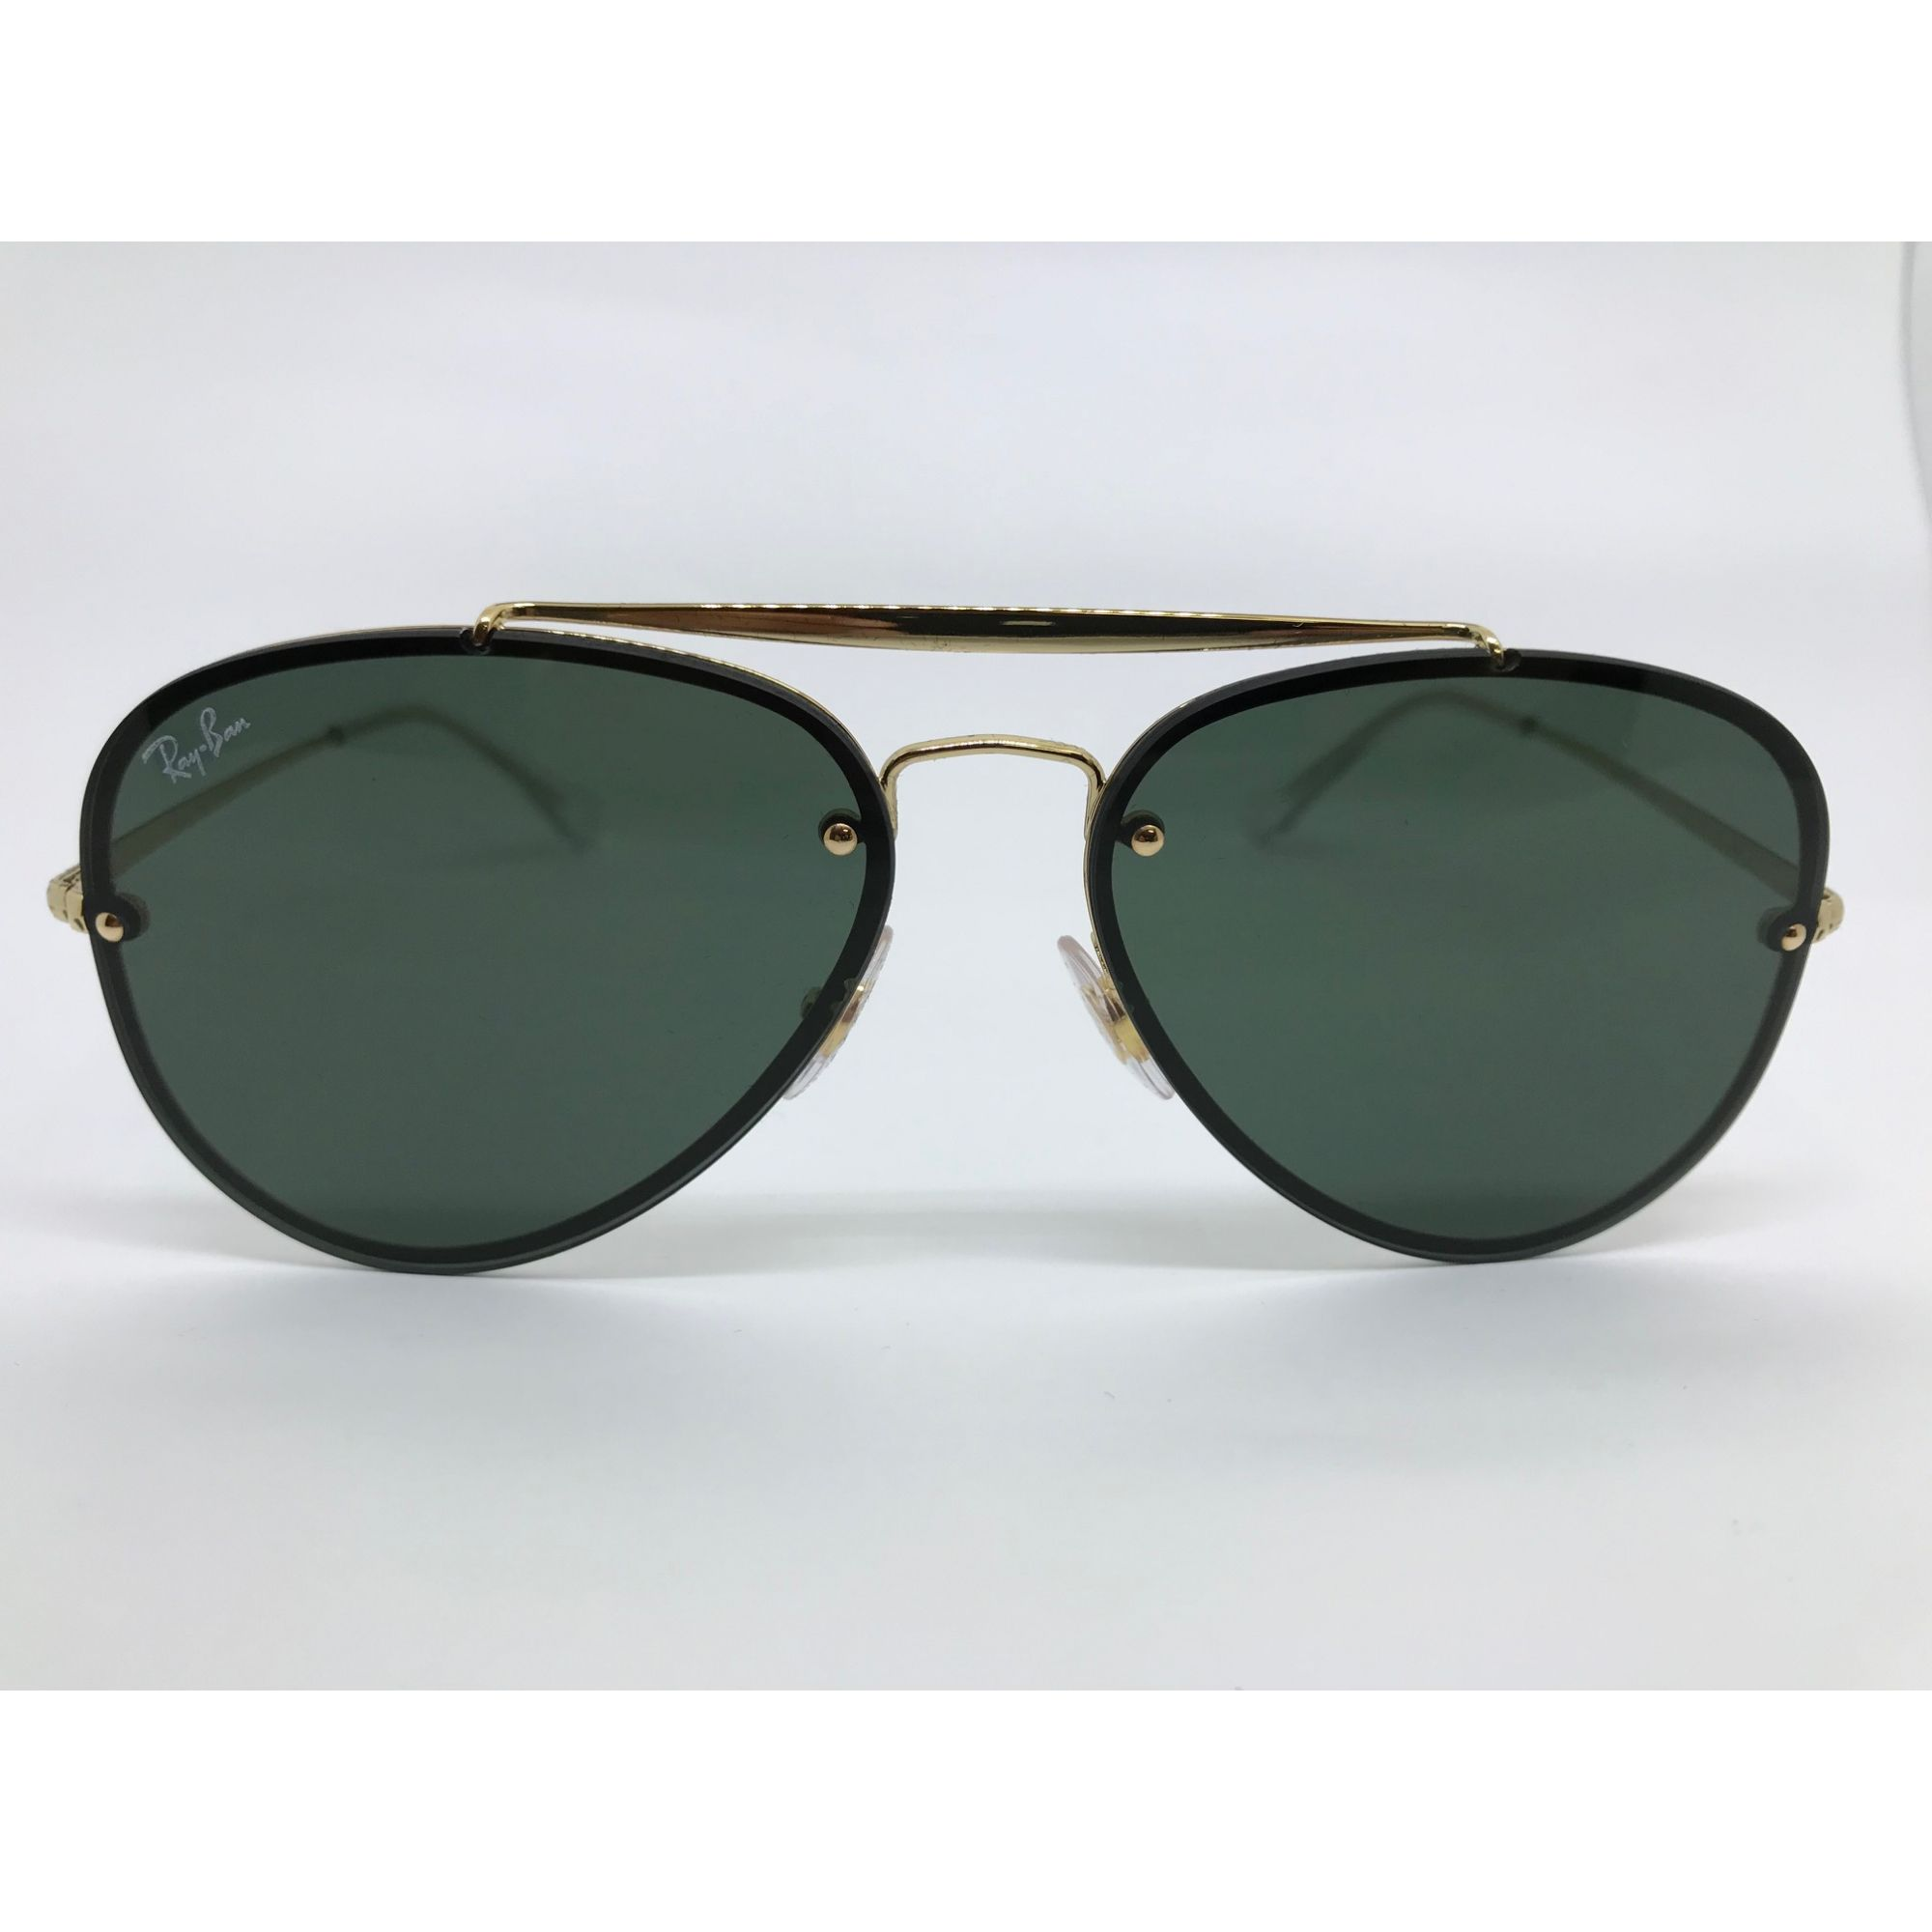 f3b8e5750a850 Oculos de sol Ray Ban Blaze Aviator RB 3584N 905071 58